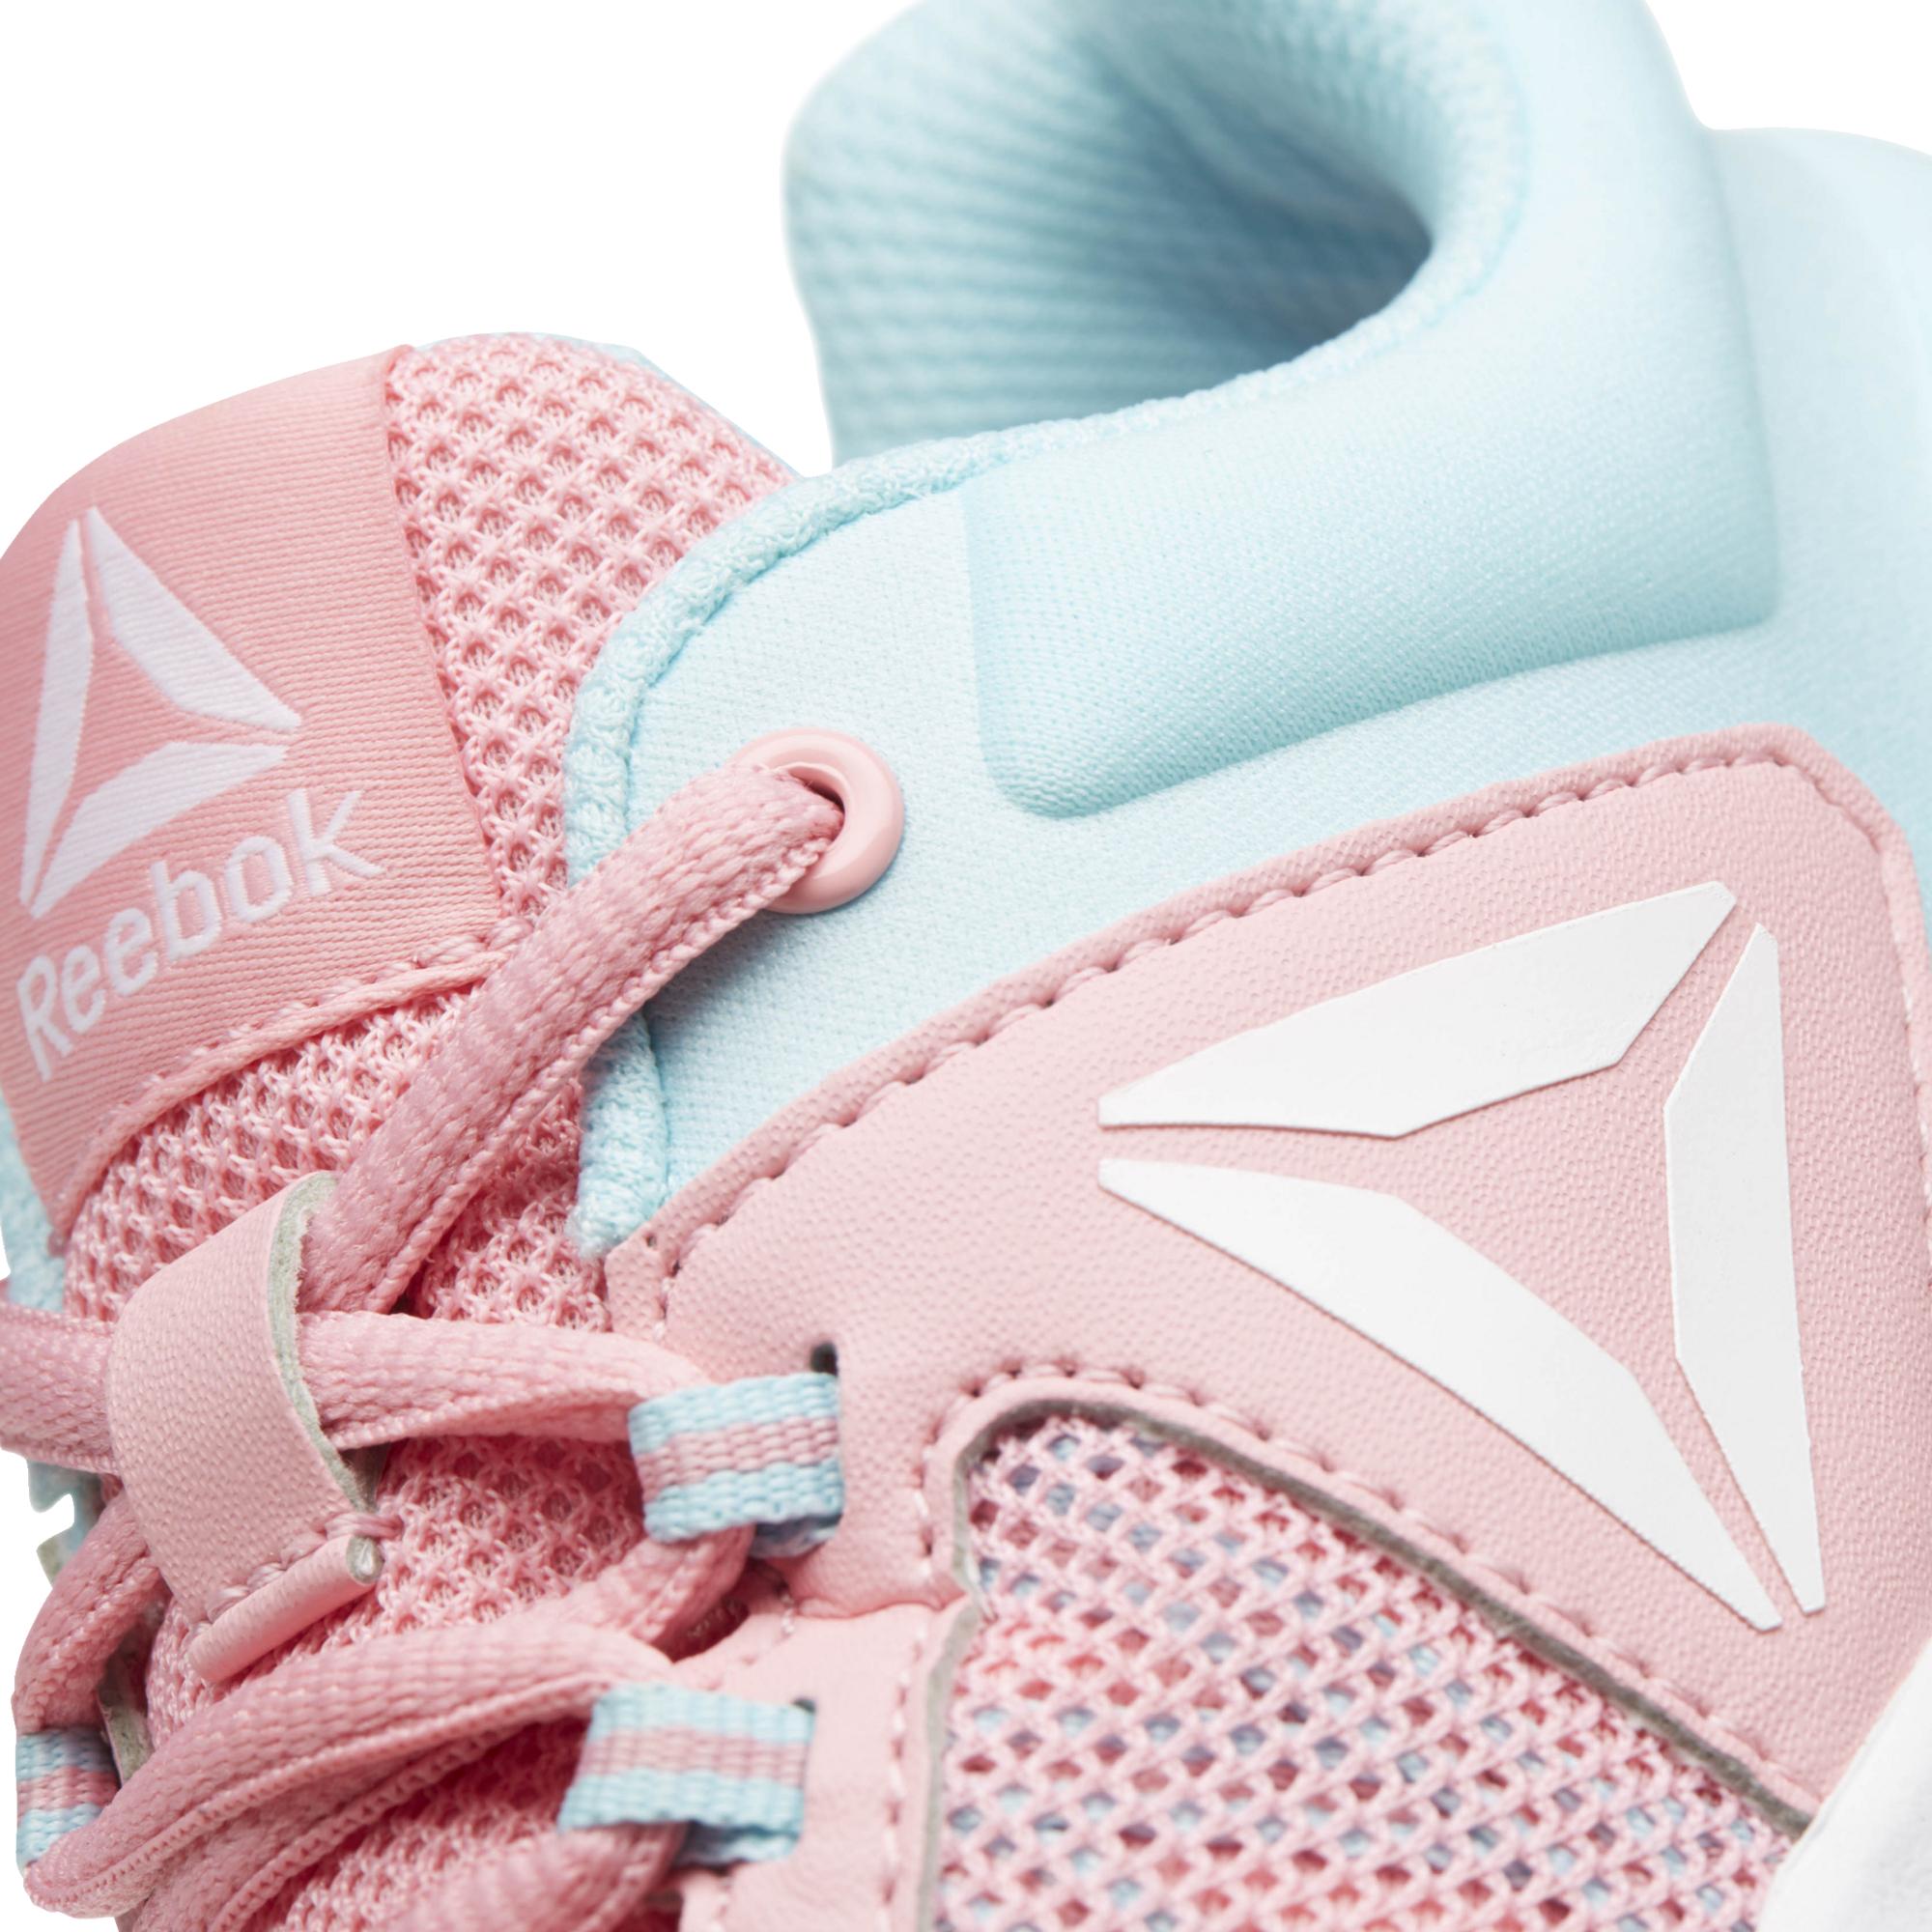 Reebok Training Shoes & Fitness Australia Yourflex Train 9.0